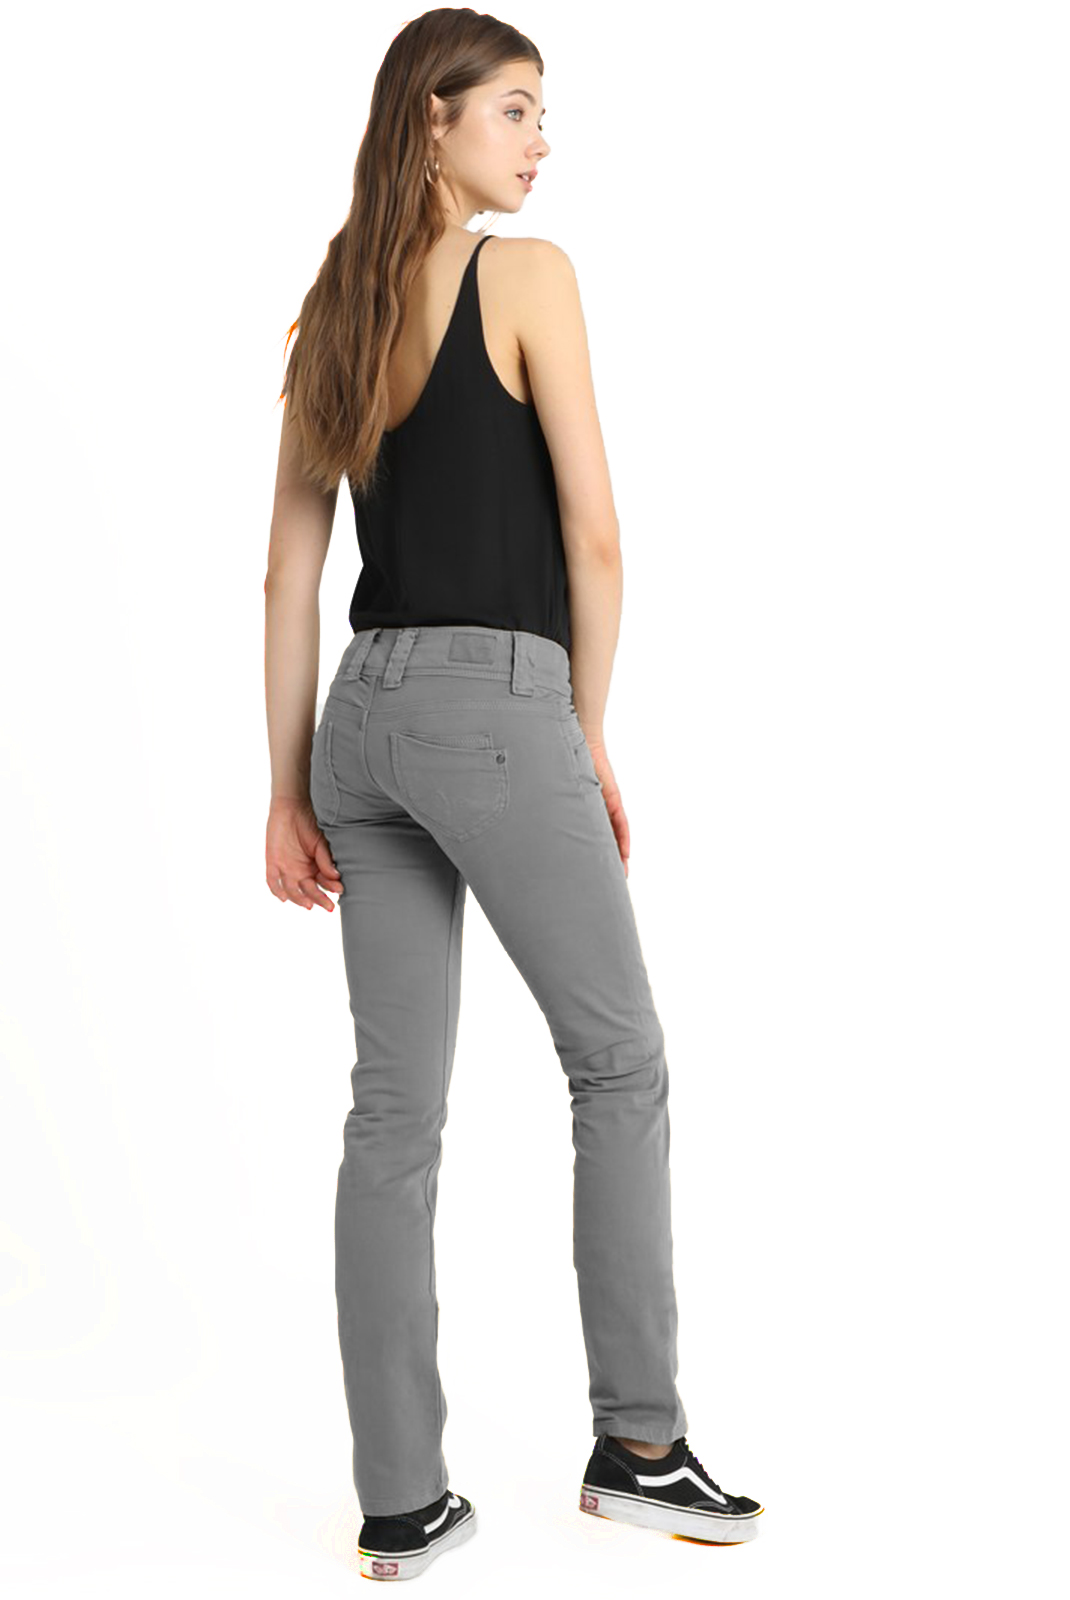 Jeans   Pepe jeans PL210717 venus 975